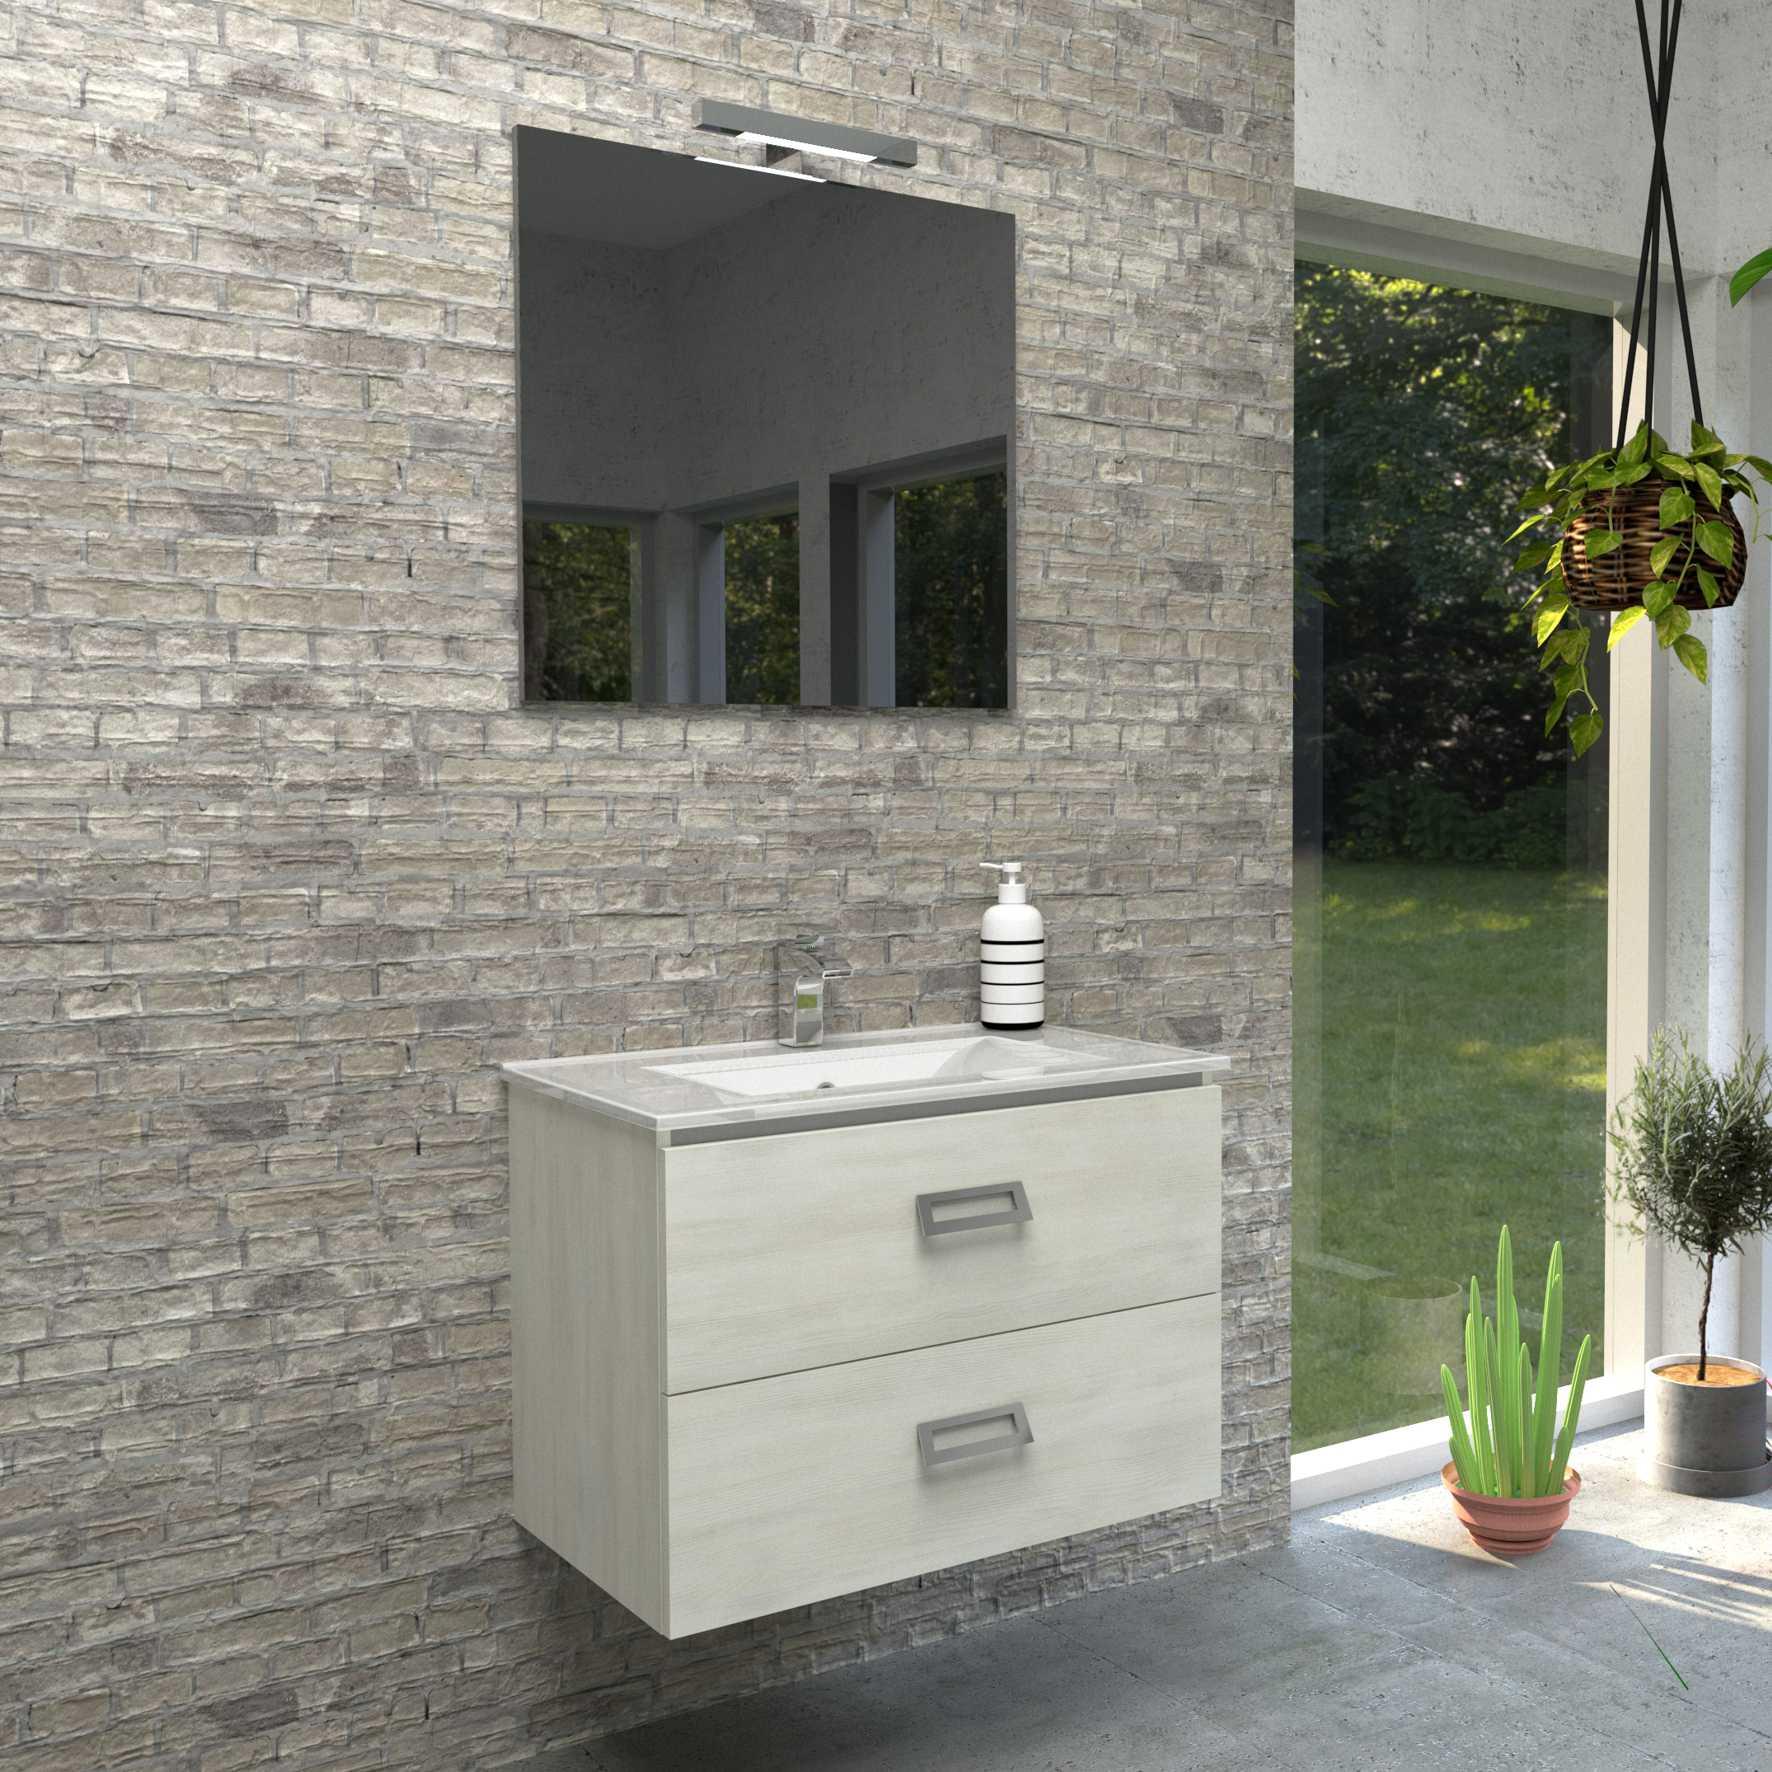 Mobile bagno sospeso QUADRO 75x46 cm bianco matrix con lavabo in ceramica